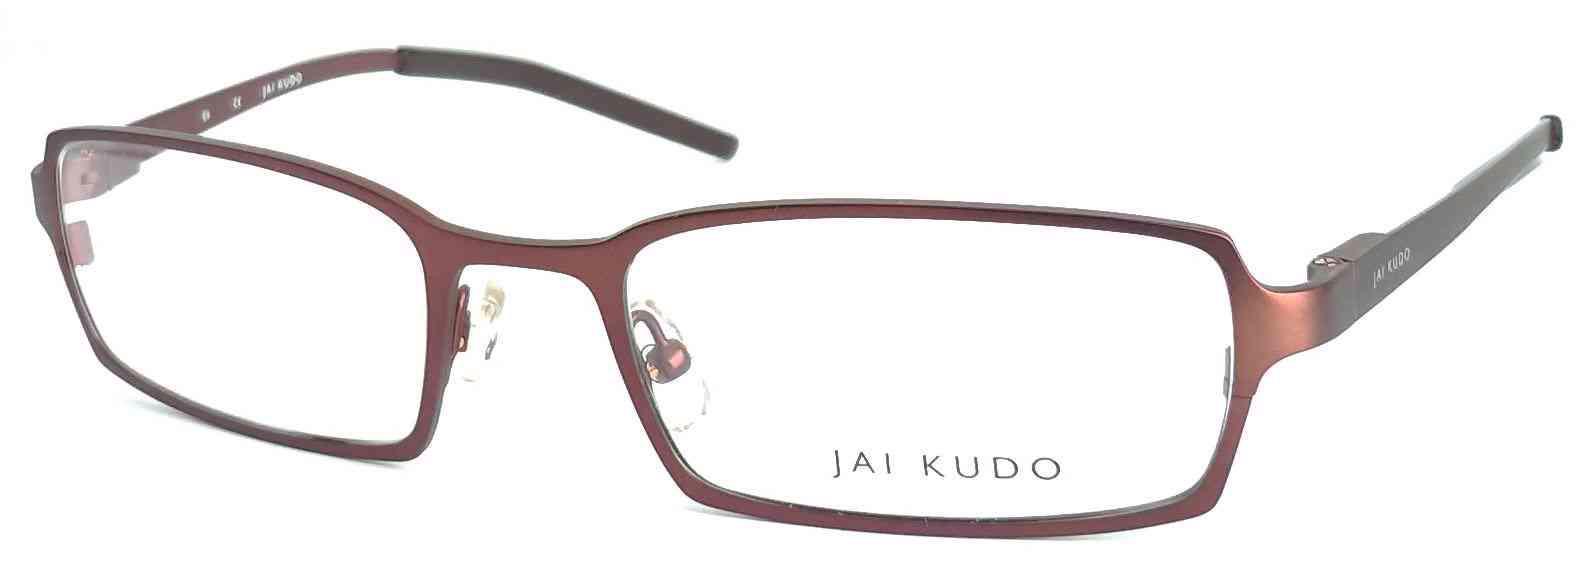 JAI KUDO 460 M03 brýlové obruby 51-19-135 MOC: 2600 Kč